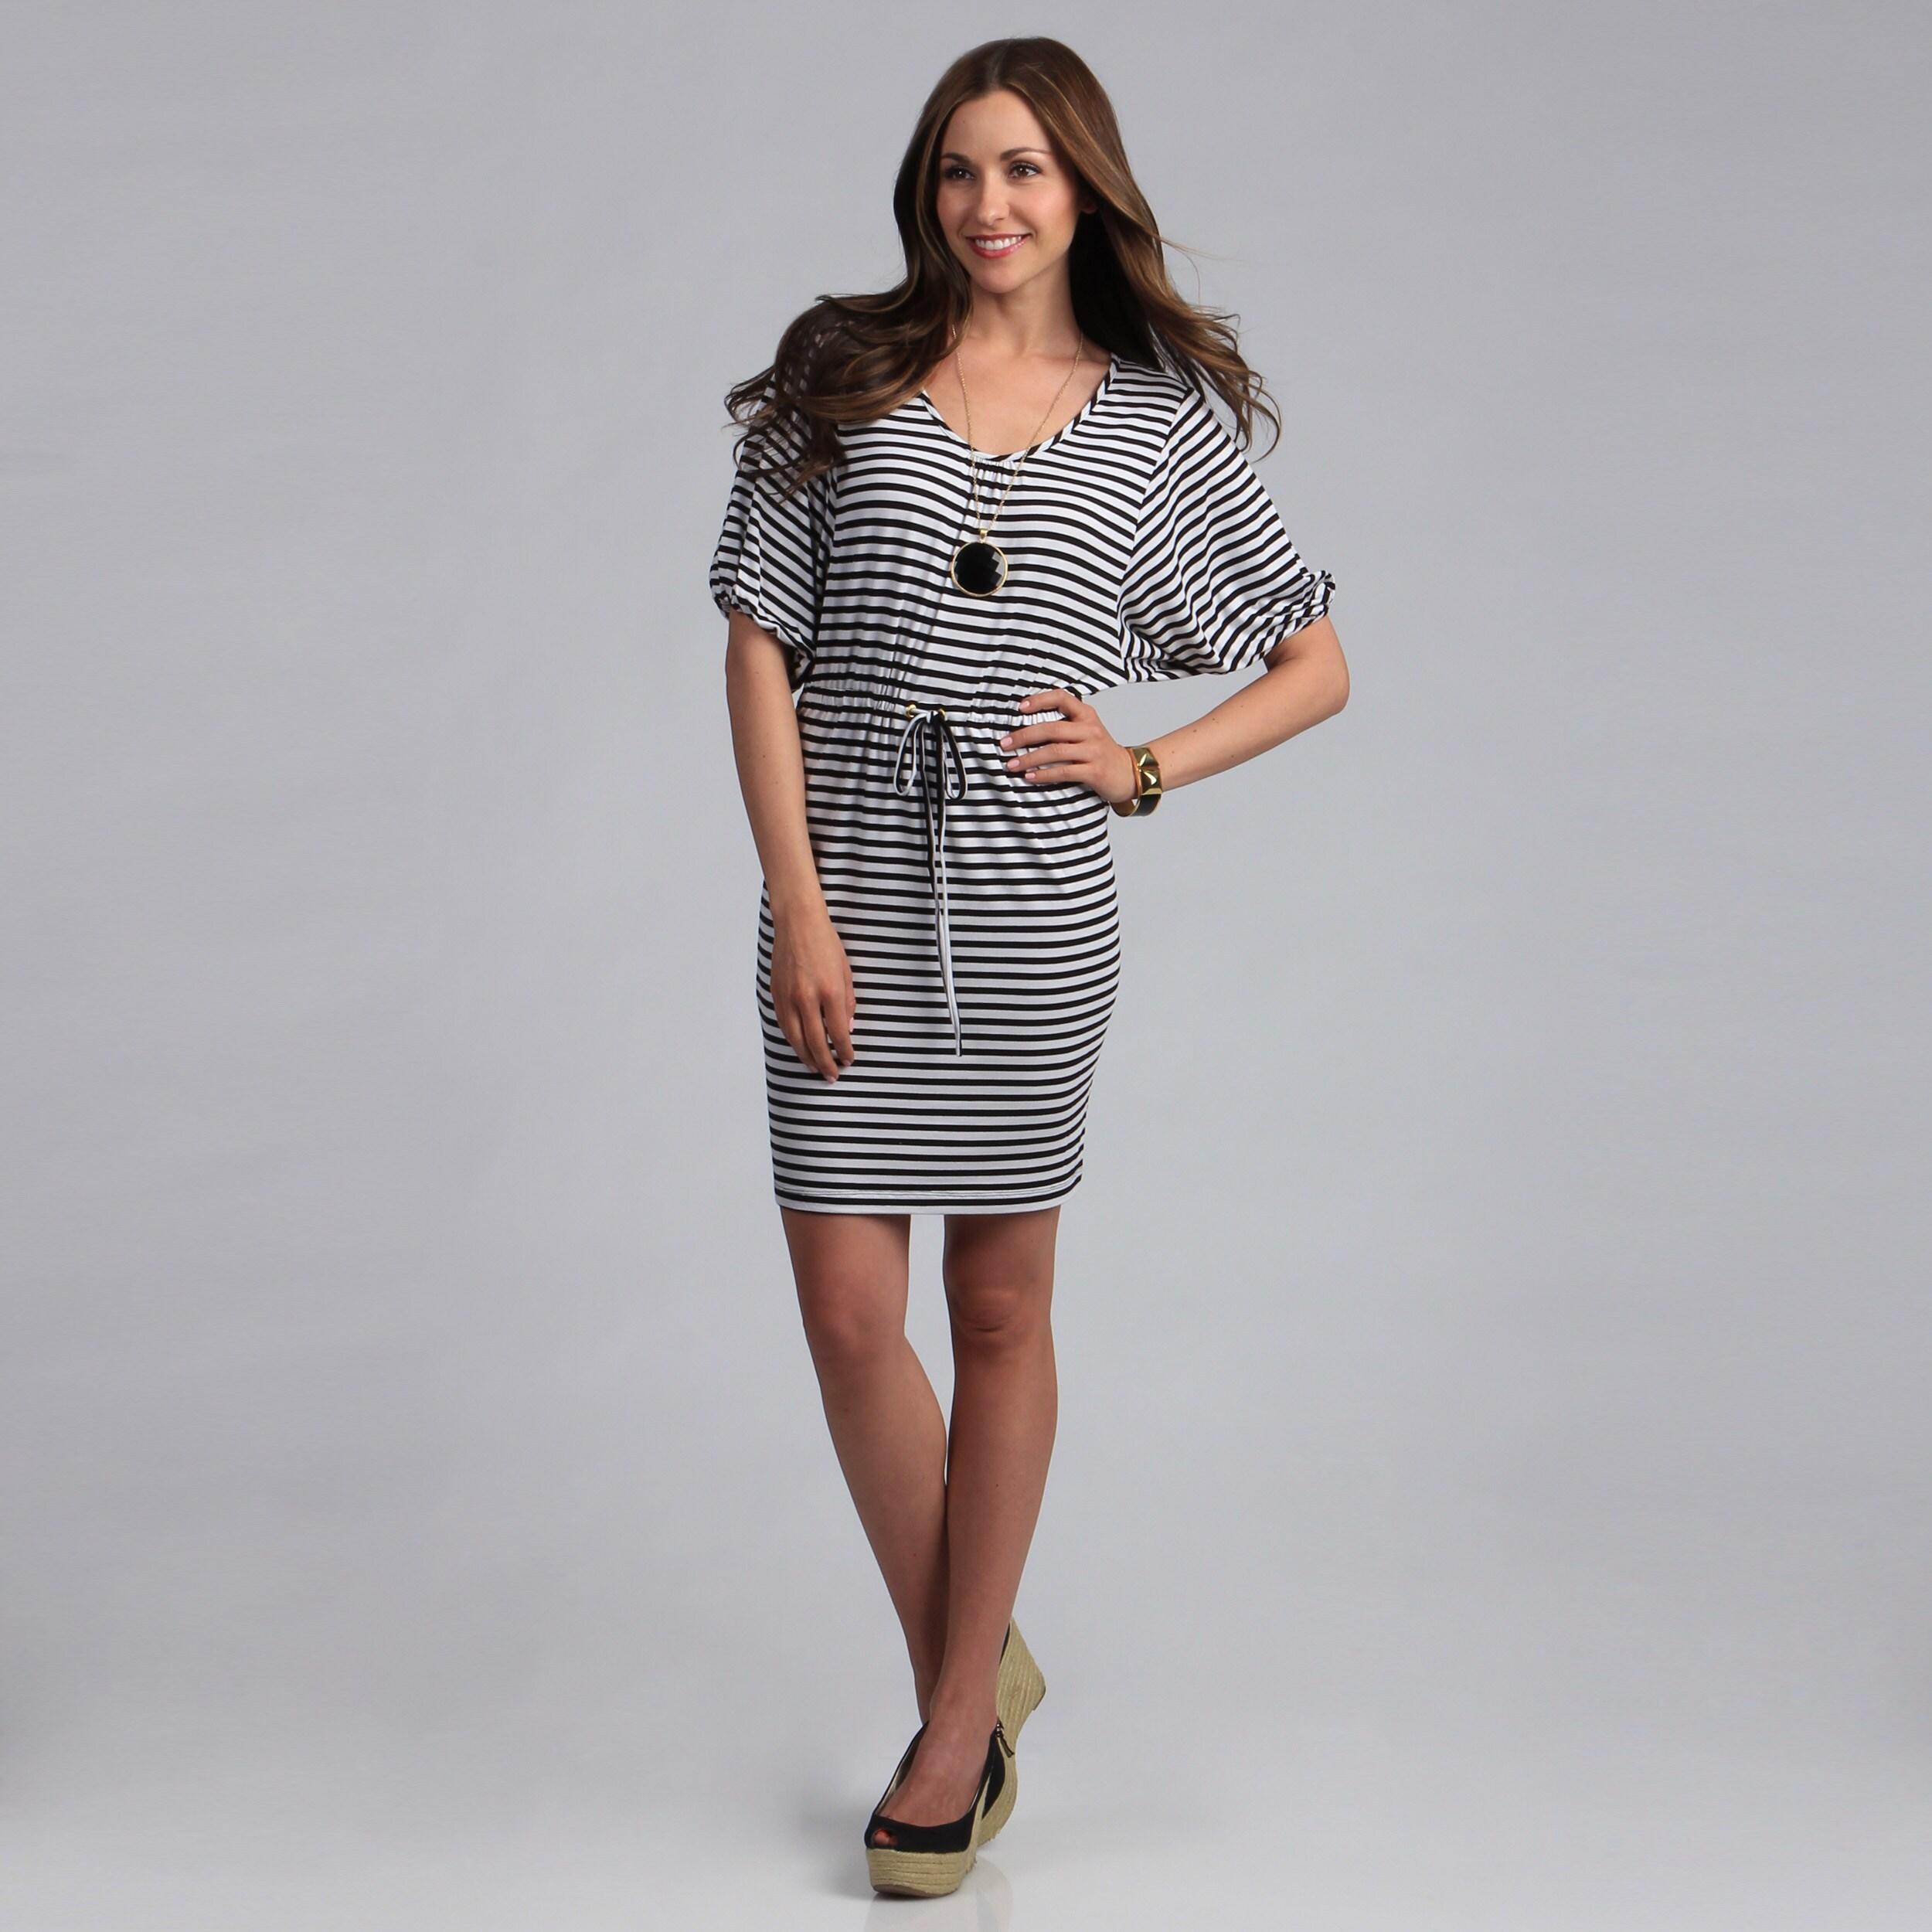 Calvin klein womens clothing. Women clothing stores